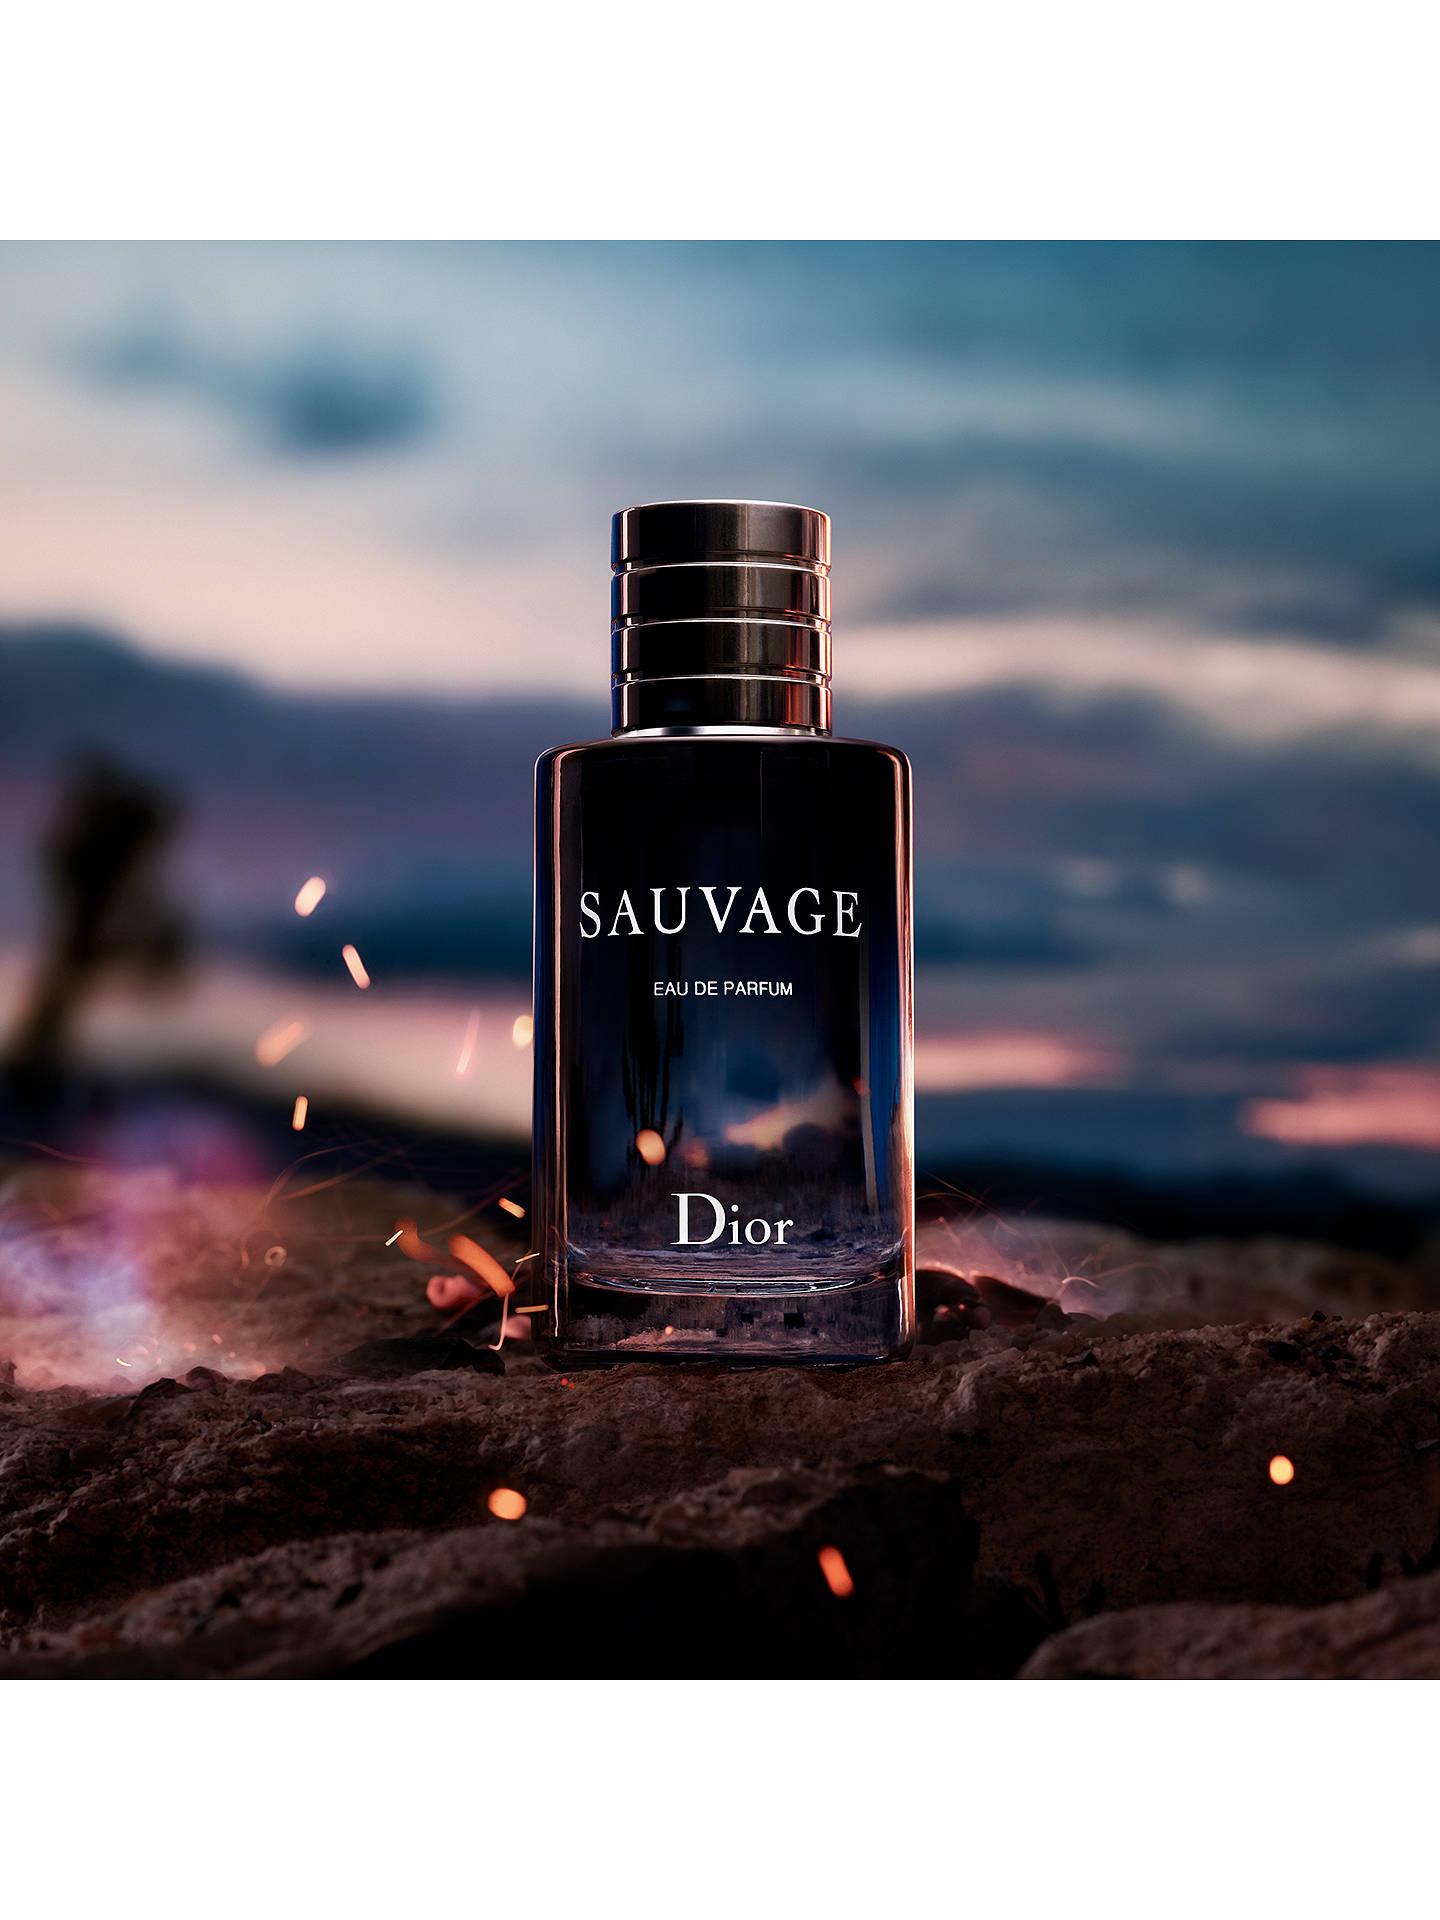 fbdfb0f7e5 Dior Sauvage Eau de Parfum at John Lewis   Partners